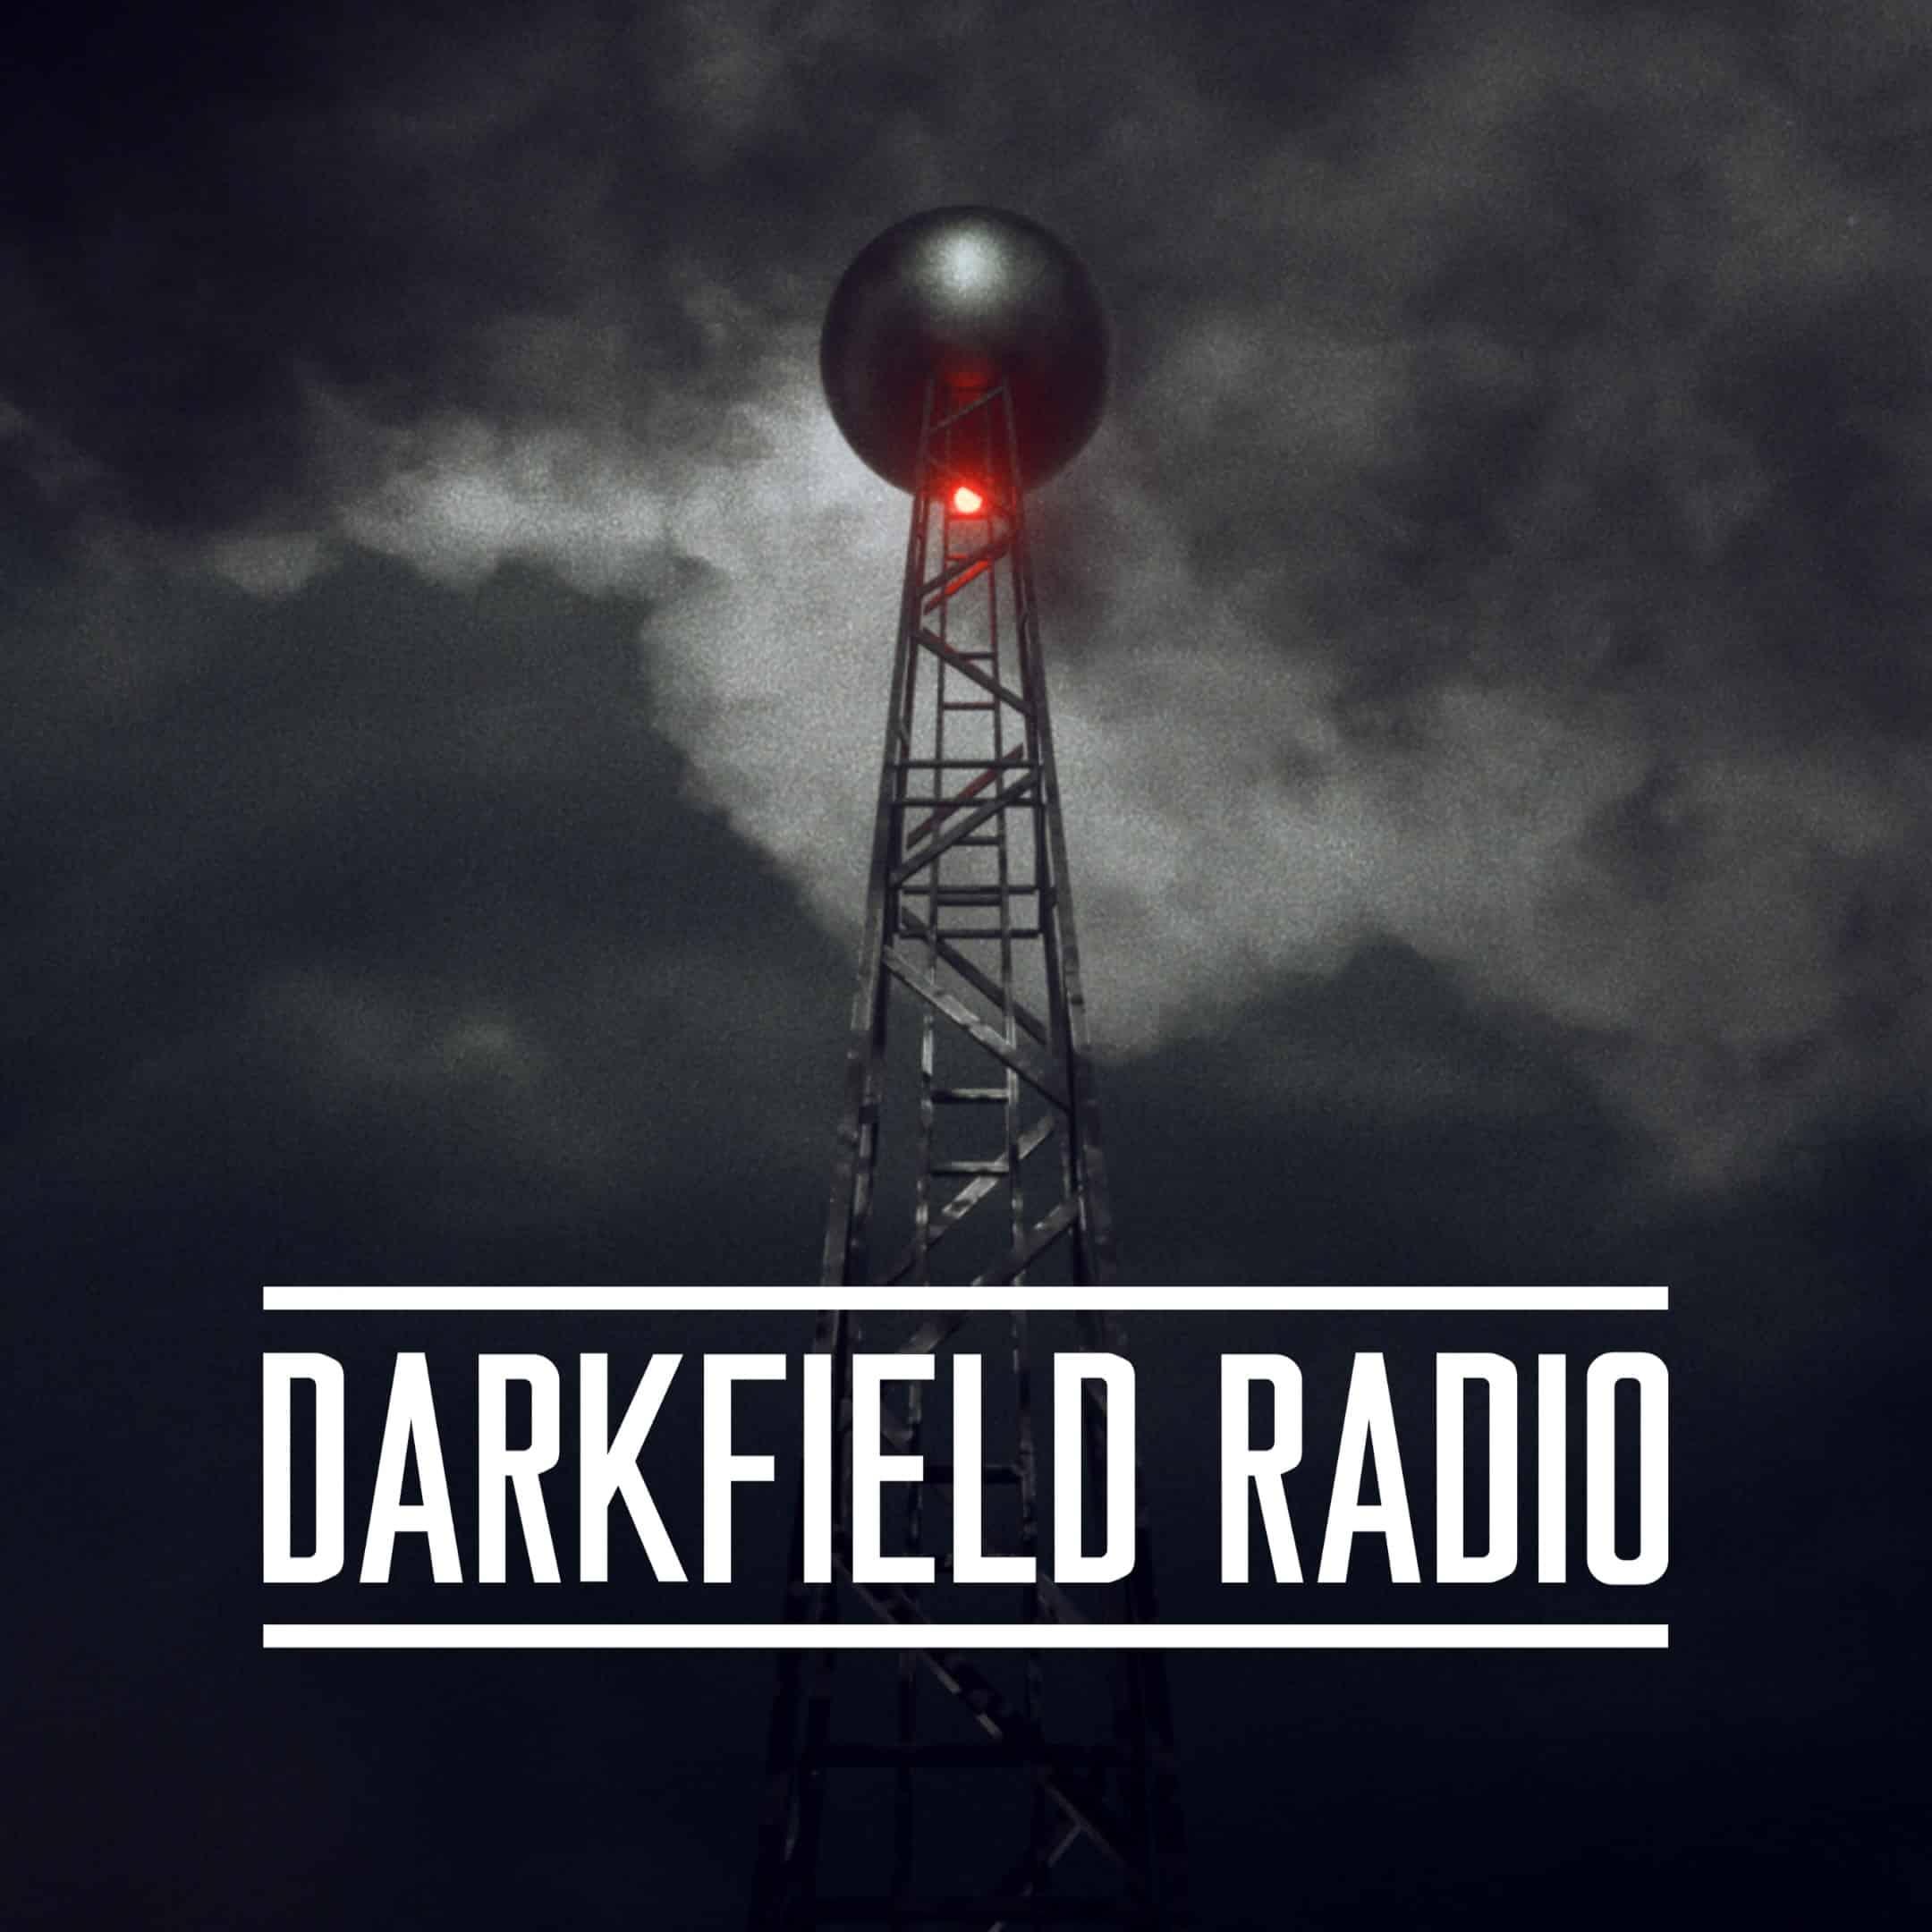 Robert's Review: Darkfield Radio's Immersive Audio Experiences